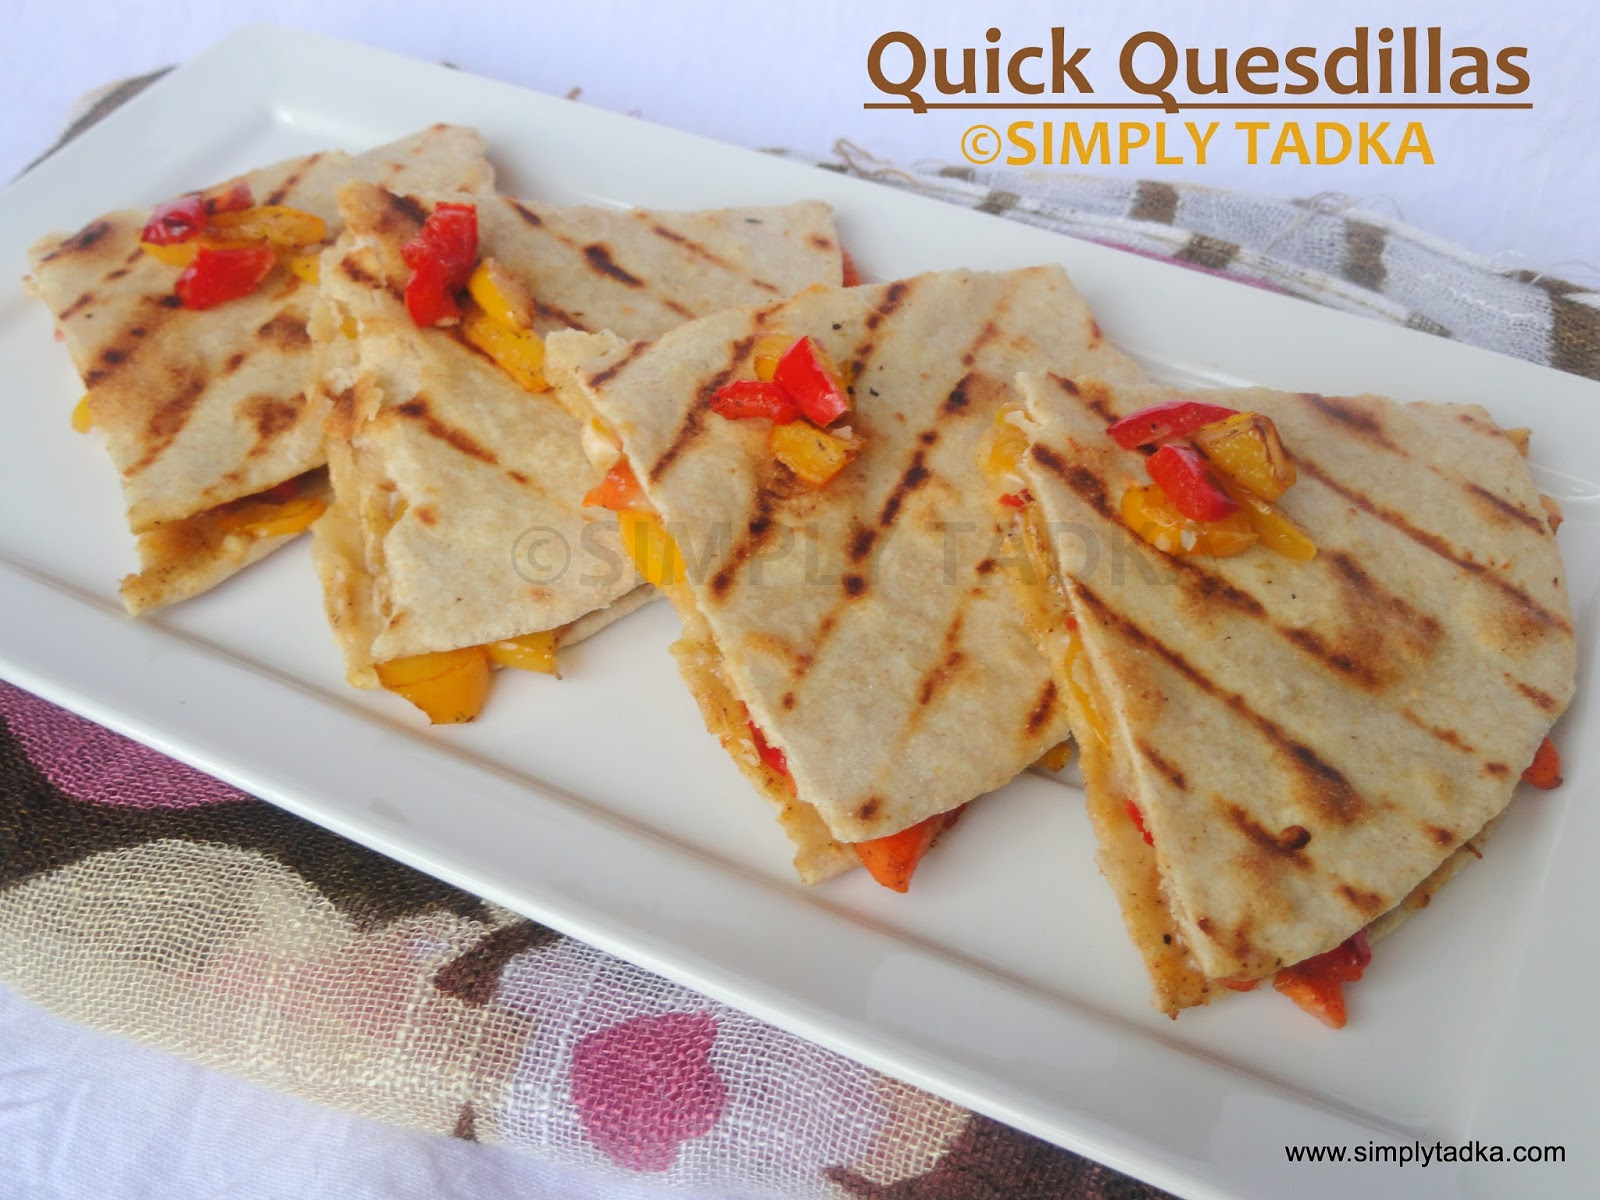 Quick quesadillas mexican cuisine simply tadka for Cuisine quick